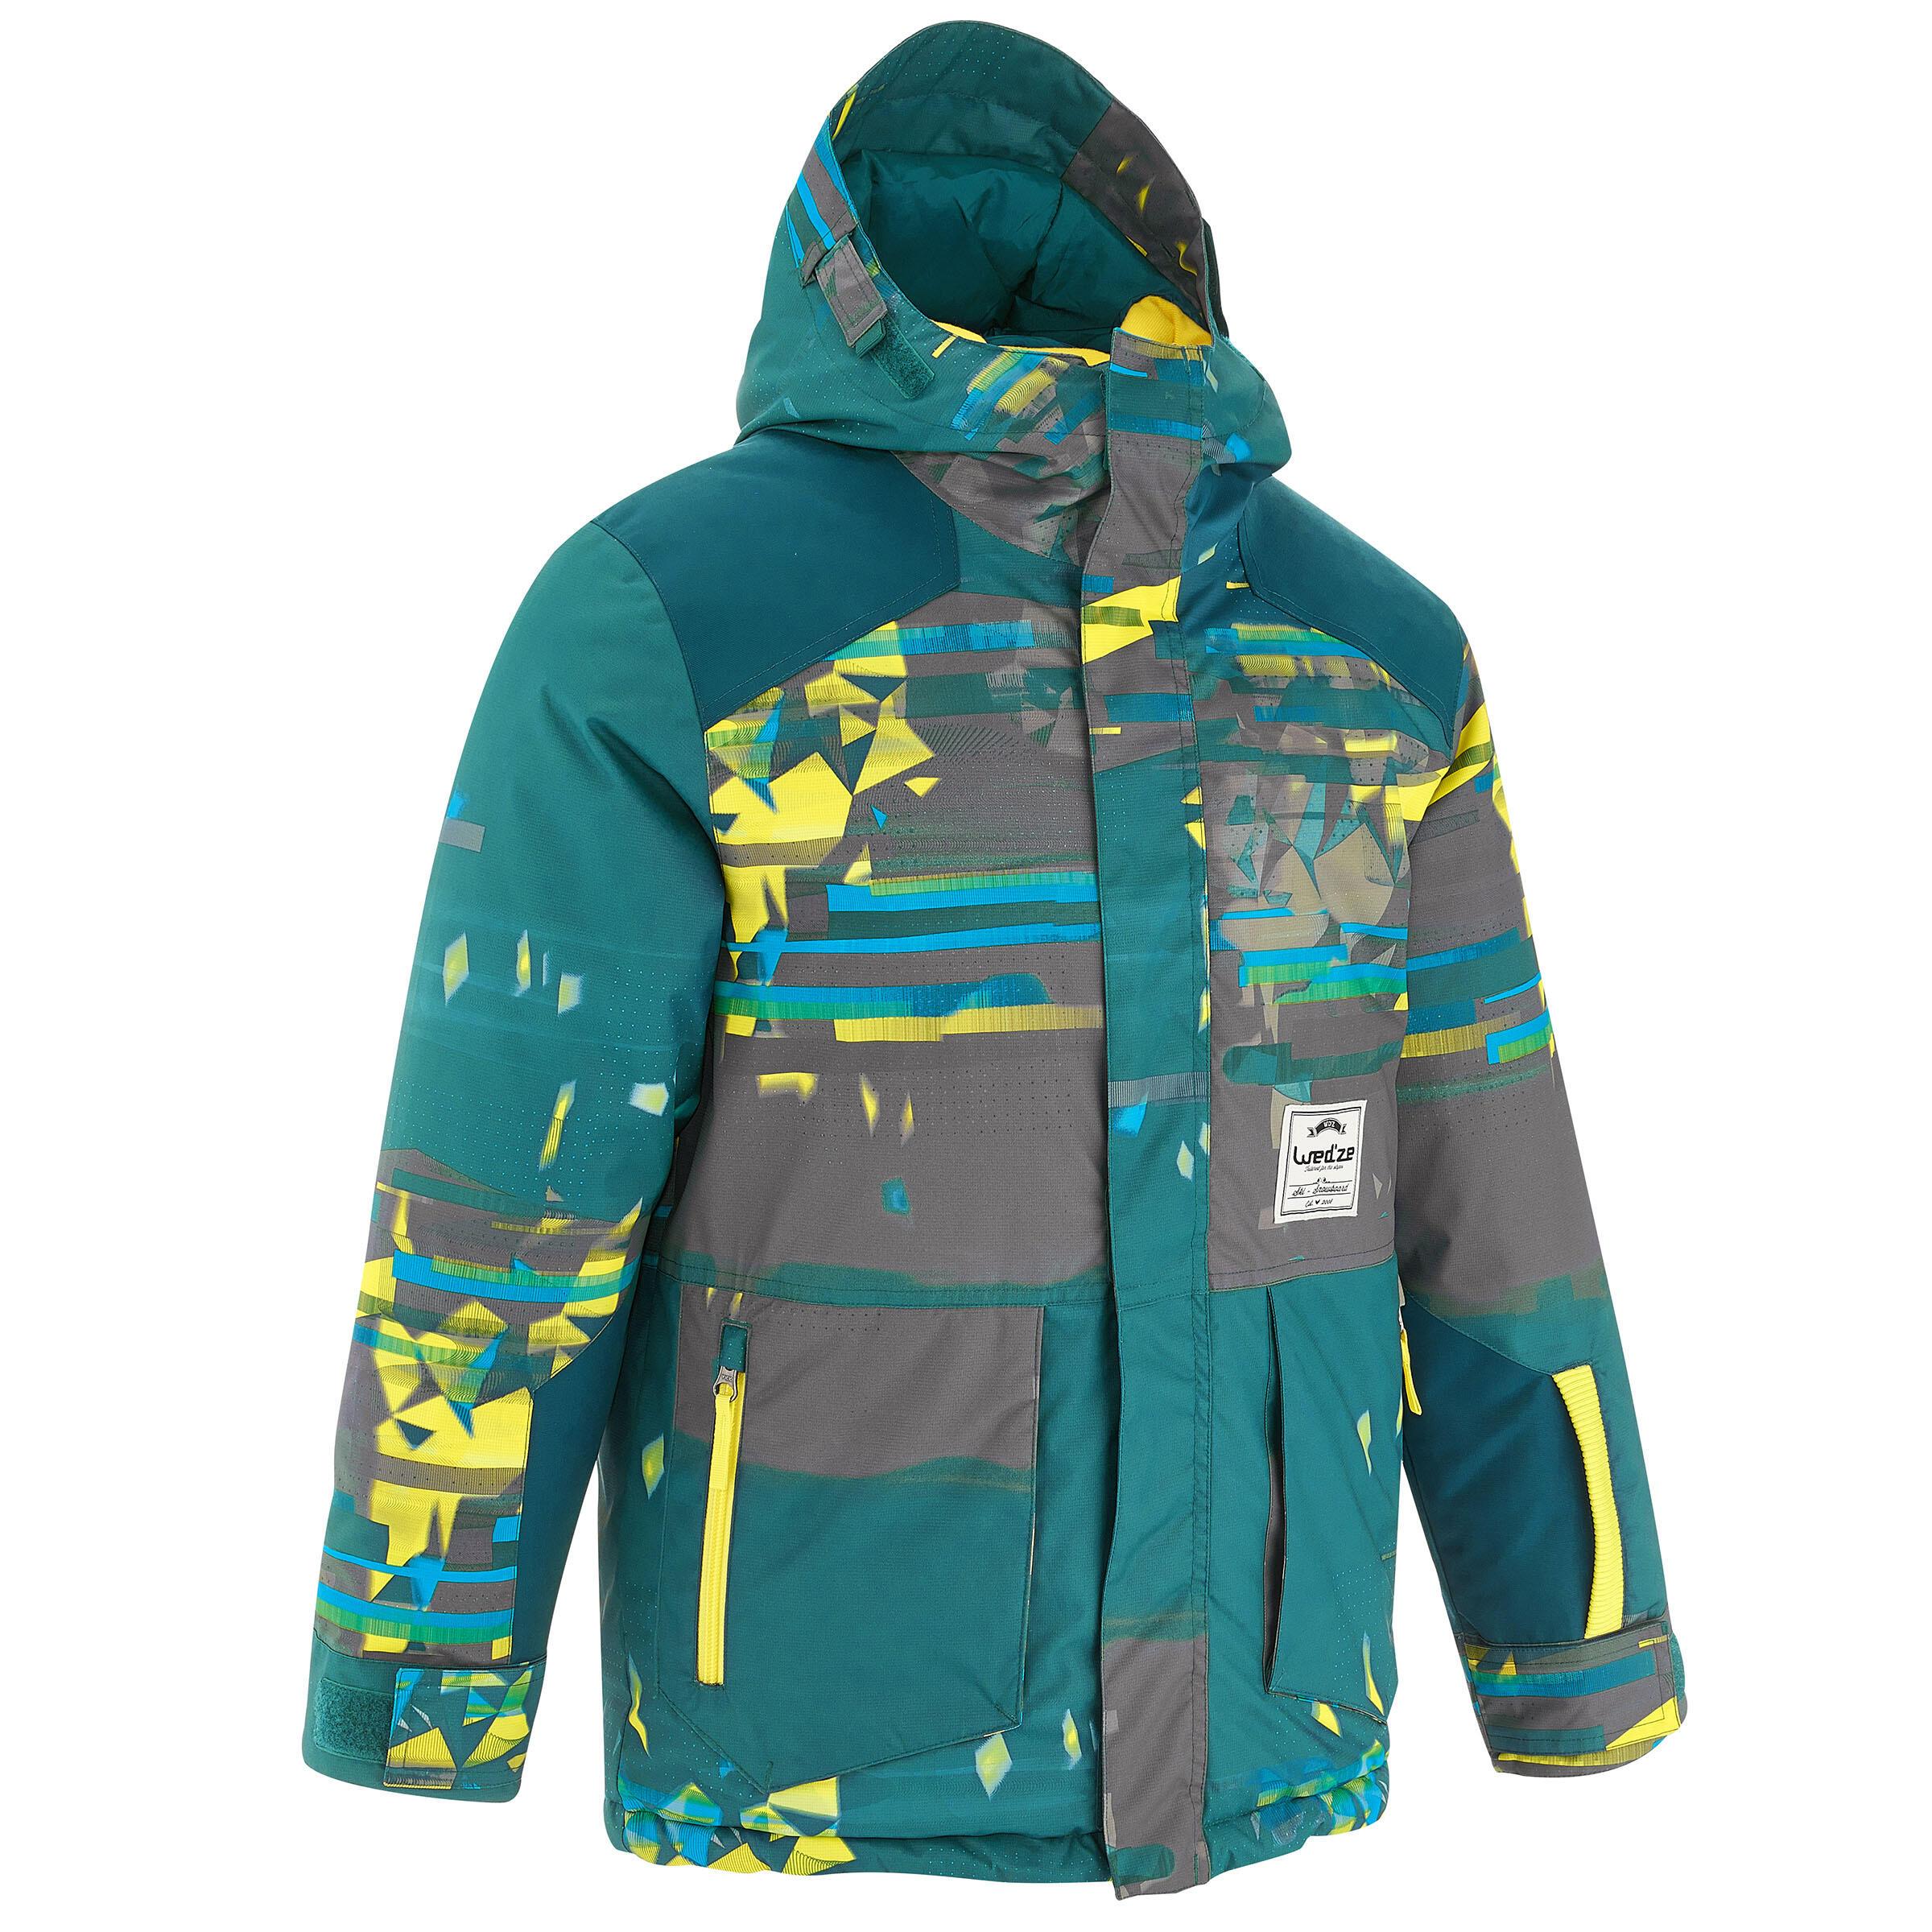 Jungen,Kinder Snowboardjacke Skijacke SNB JKT 500 Jungen petrolgrün | 03608449881241